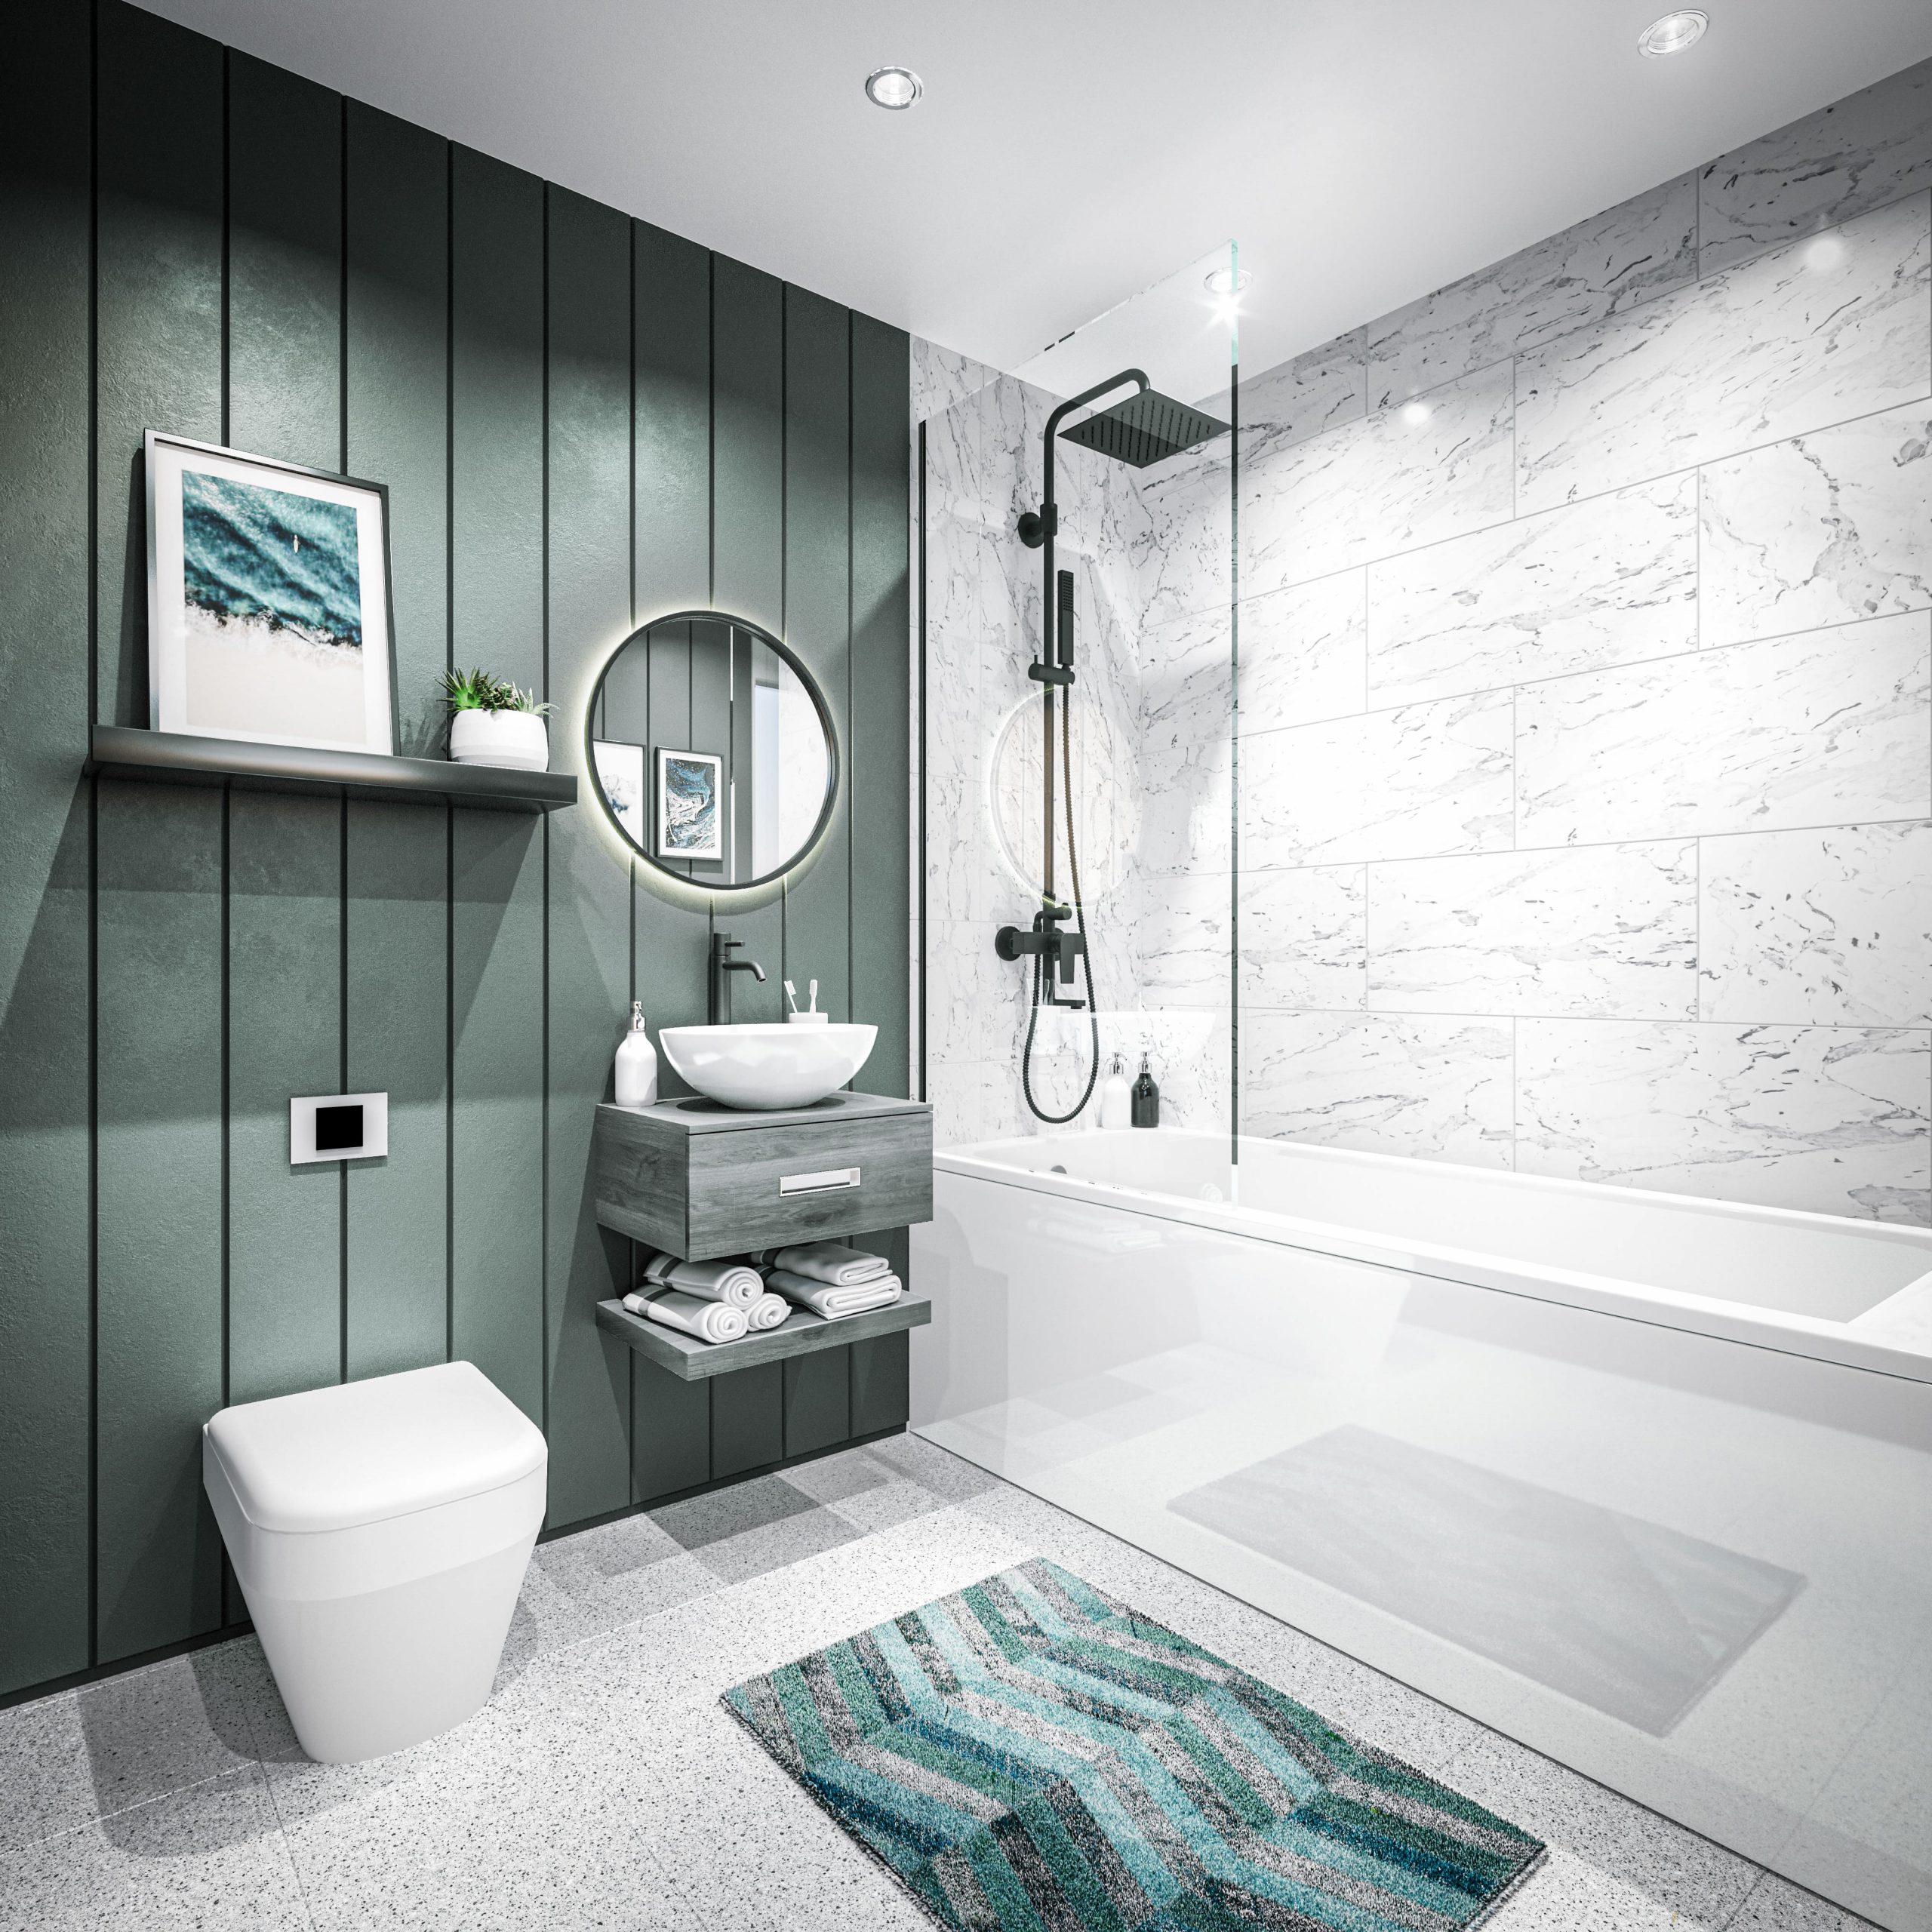 Generation_CO_property_CGI_Visualisation_Manchester_bathroom_1